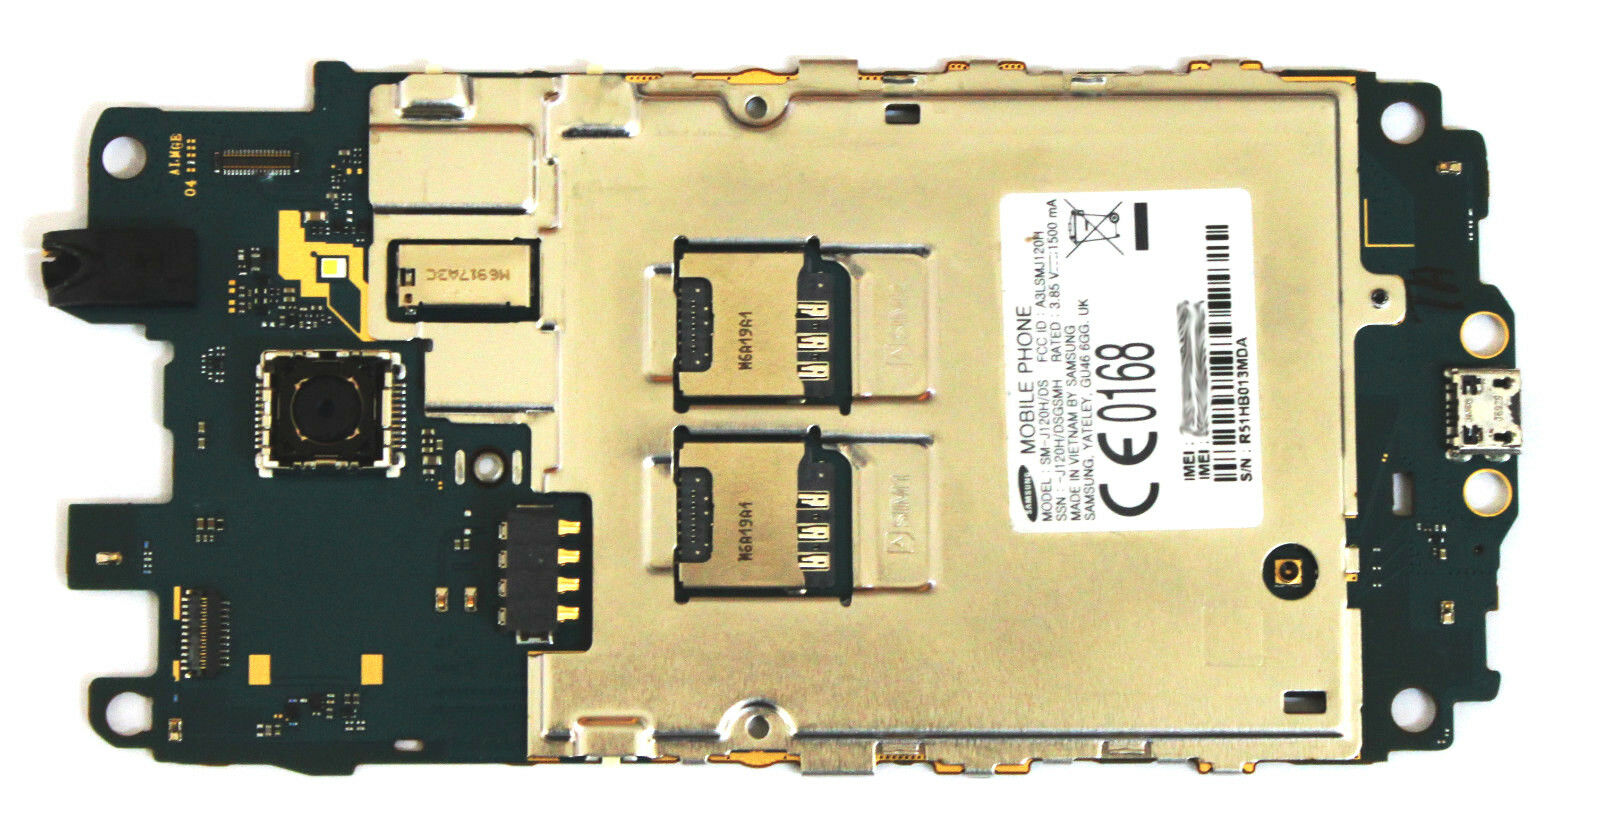 OEM UNLOCKED SAMSUNG GALAXY J1 2016 DUOS SM-J120H/DS 8GB LOGIC MOTHERBOARD